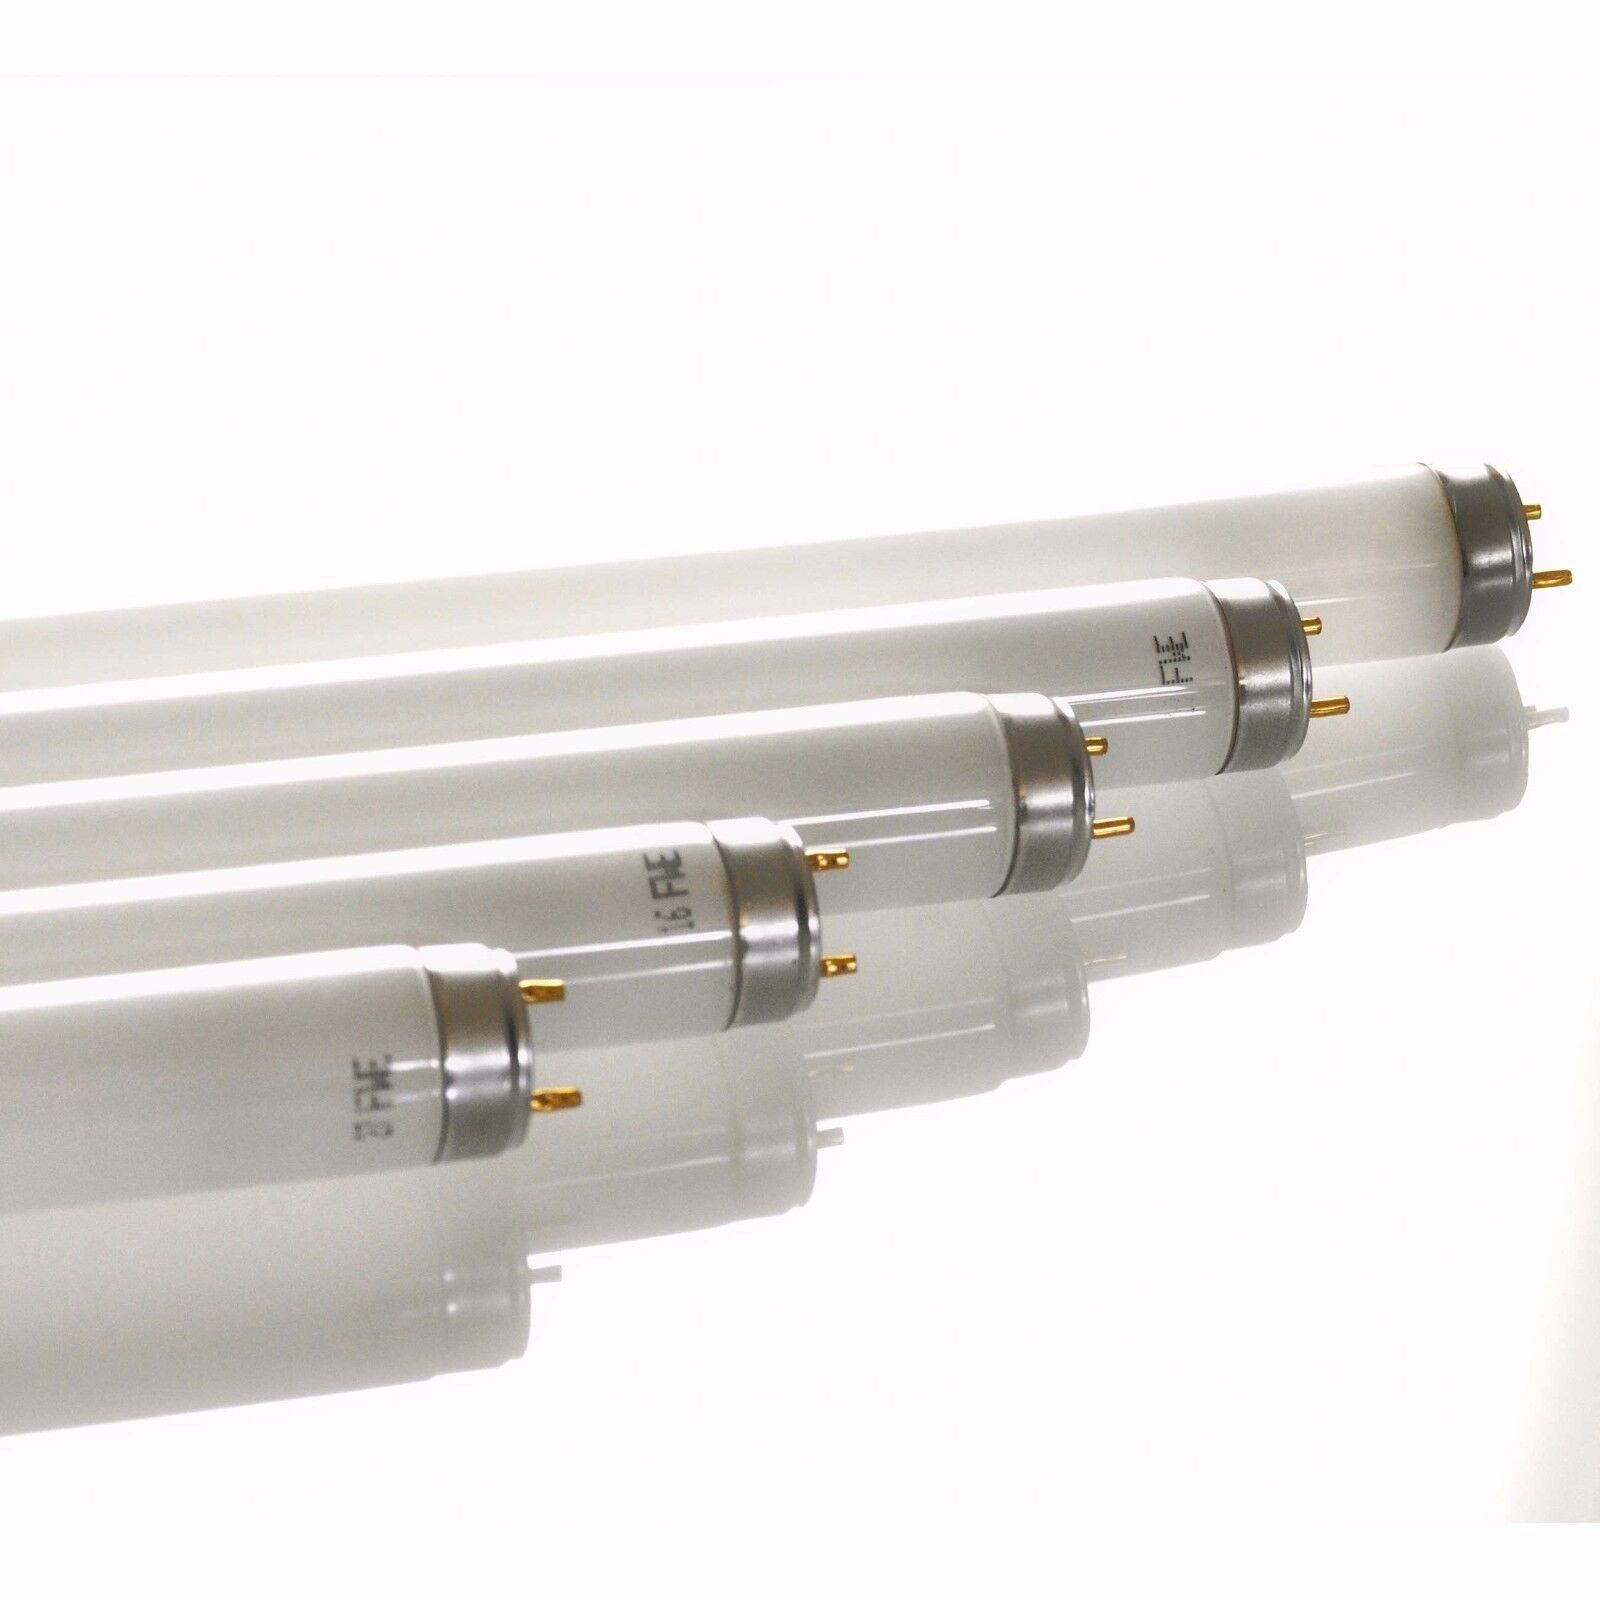 18W 36W 58W Leuchtstofflampe Leuchtstoffröhre Leuchtstoffröhre Leuchtstoffröhre T8 26mm G13 versch Wattagen LF 8a55a3